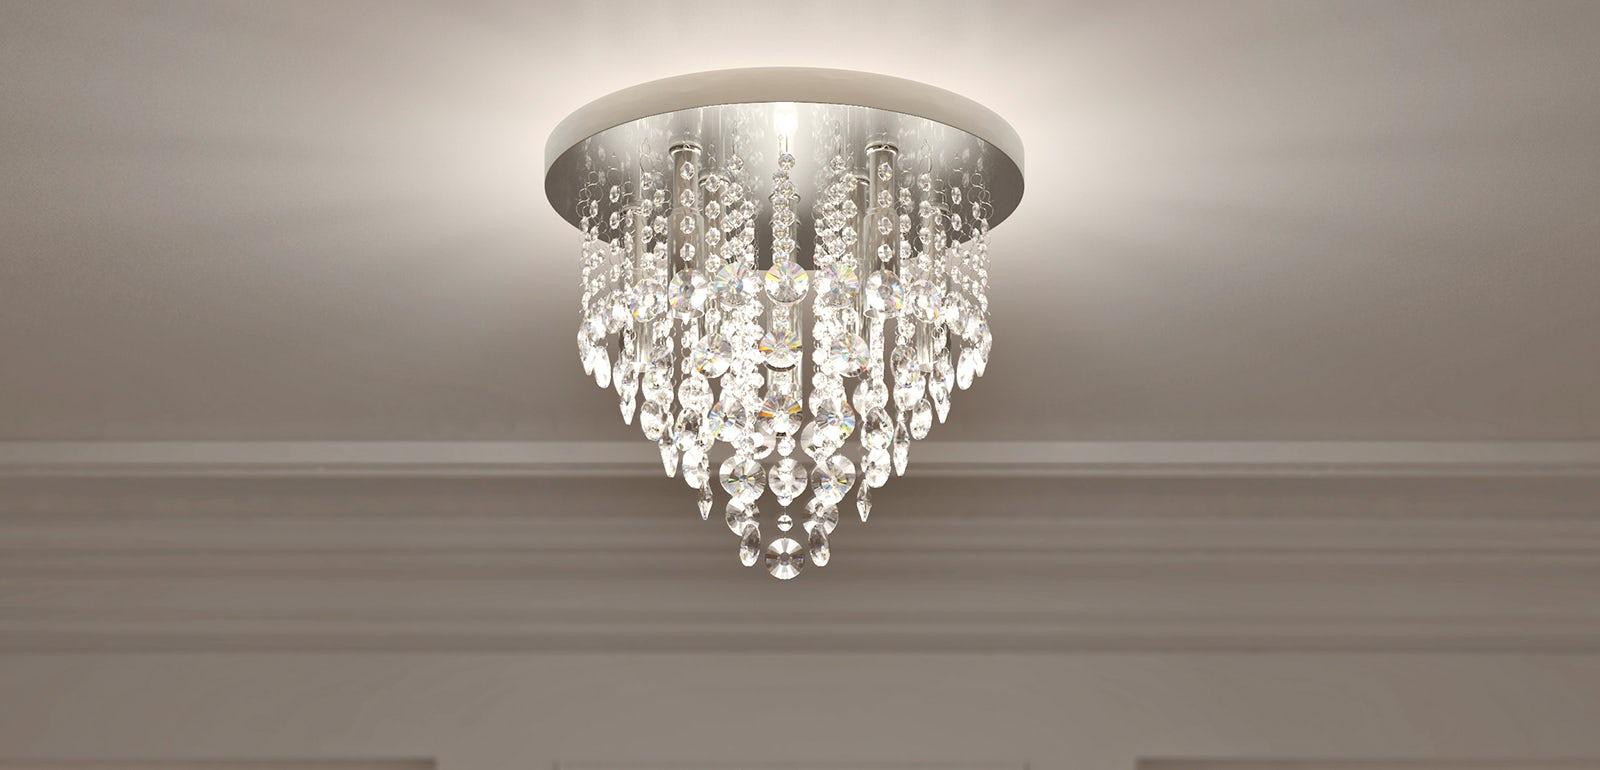 Bathroom lighting ideas for 2018